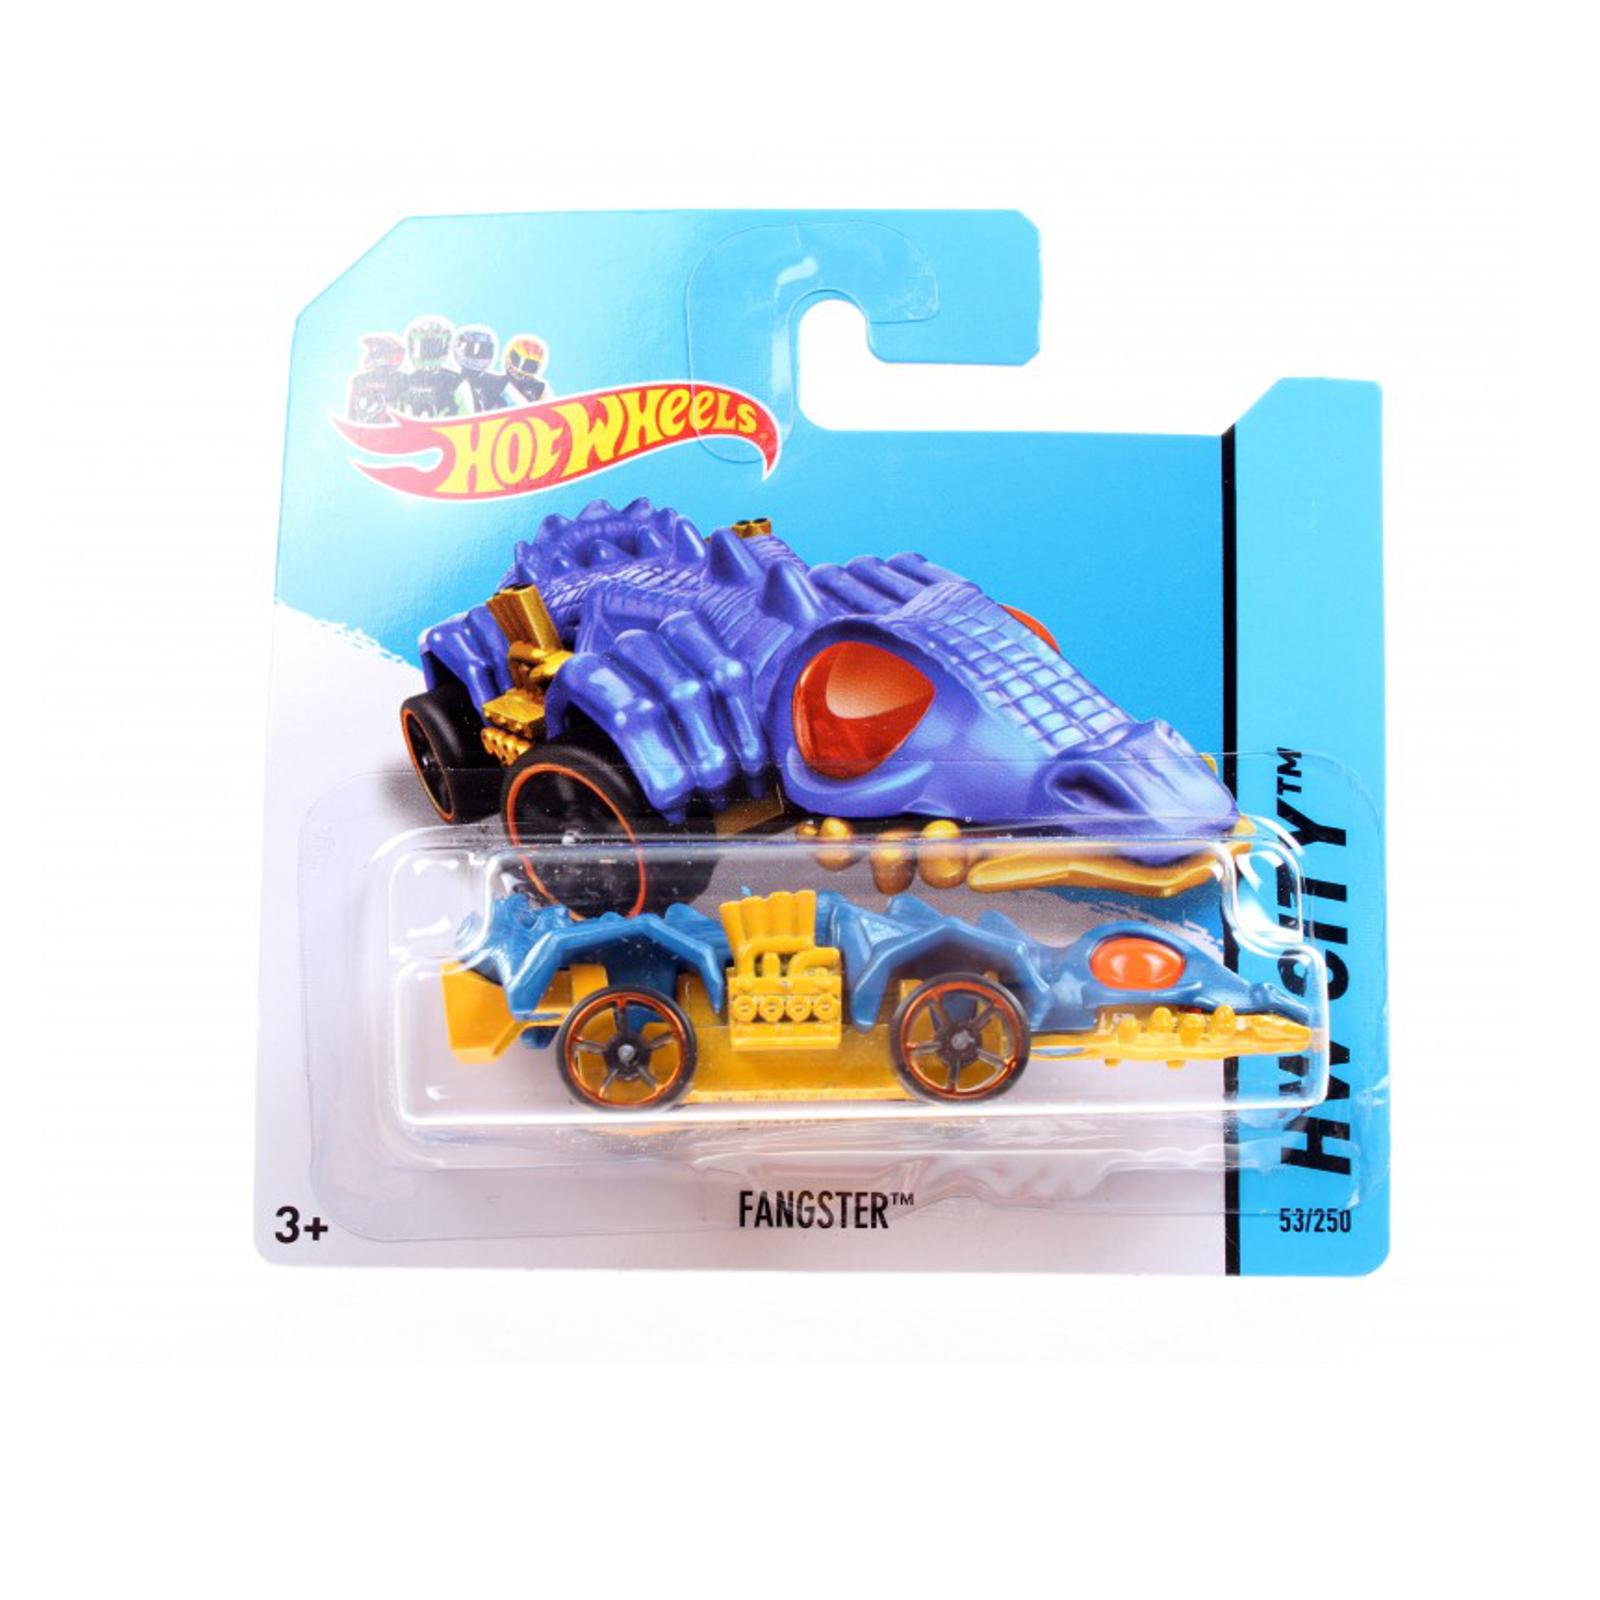 ����������� Hot Wheels ��� ������ Fangster